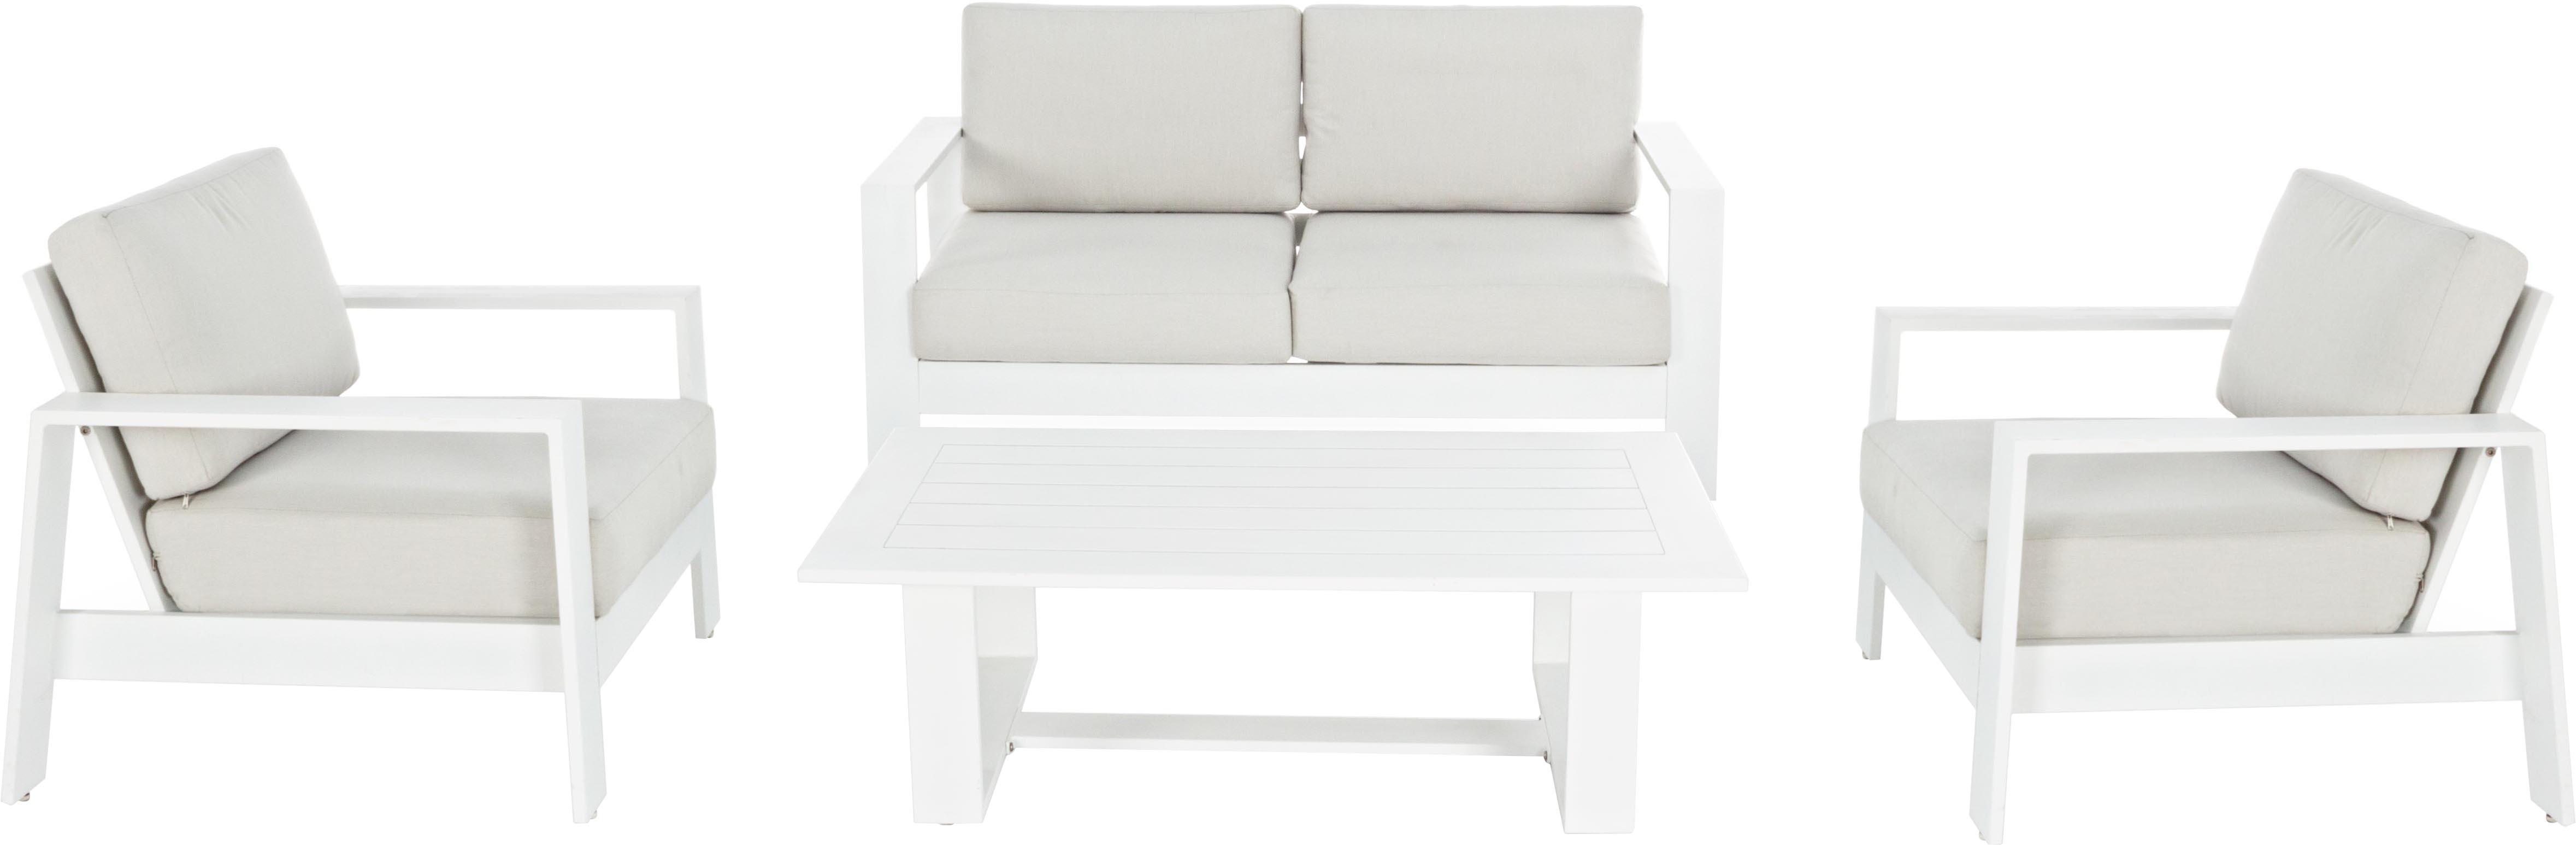 Garten-Lounge-Set Atlantic, 4-tlg., Gestell: Aluminium, pulverbeschich, Bezug: Polyester, Weiss, Hellgrau, Set mit verschiedenen Grössen